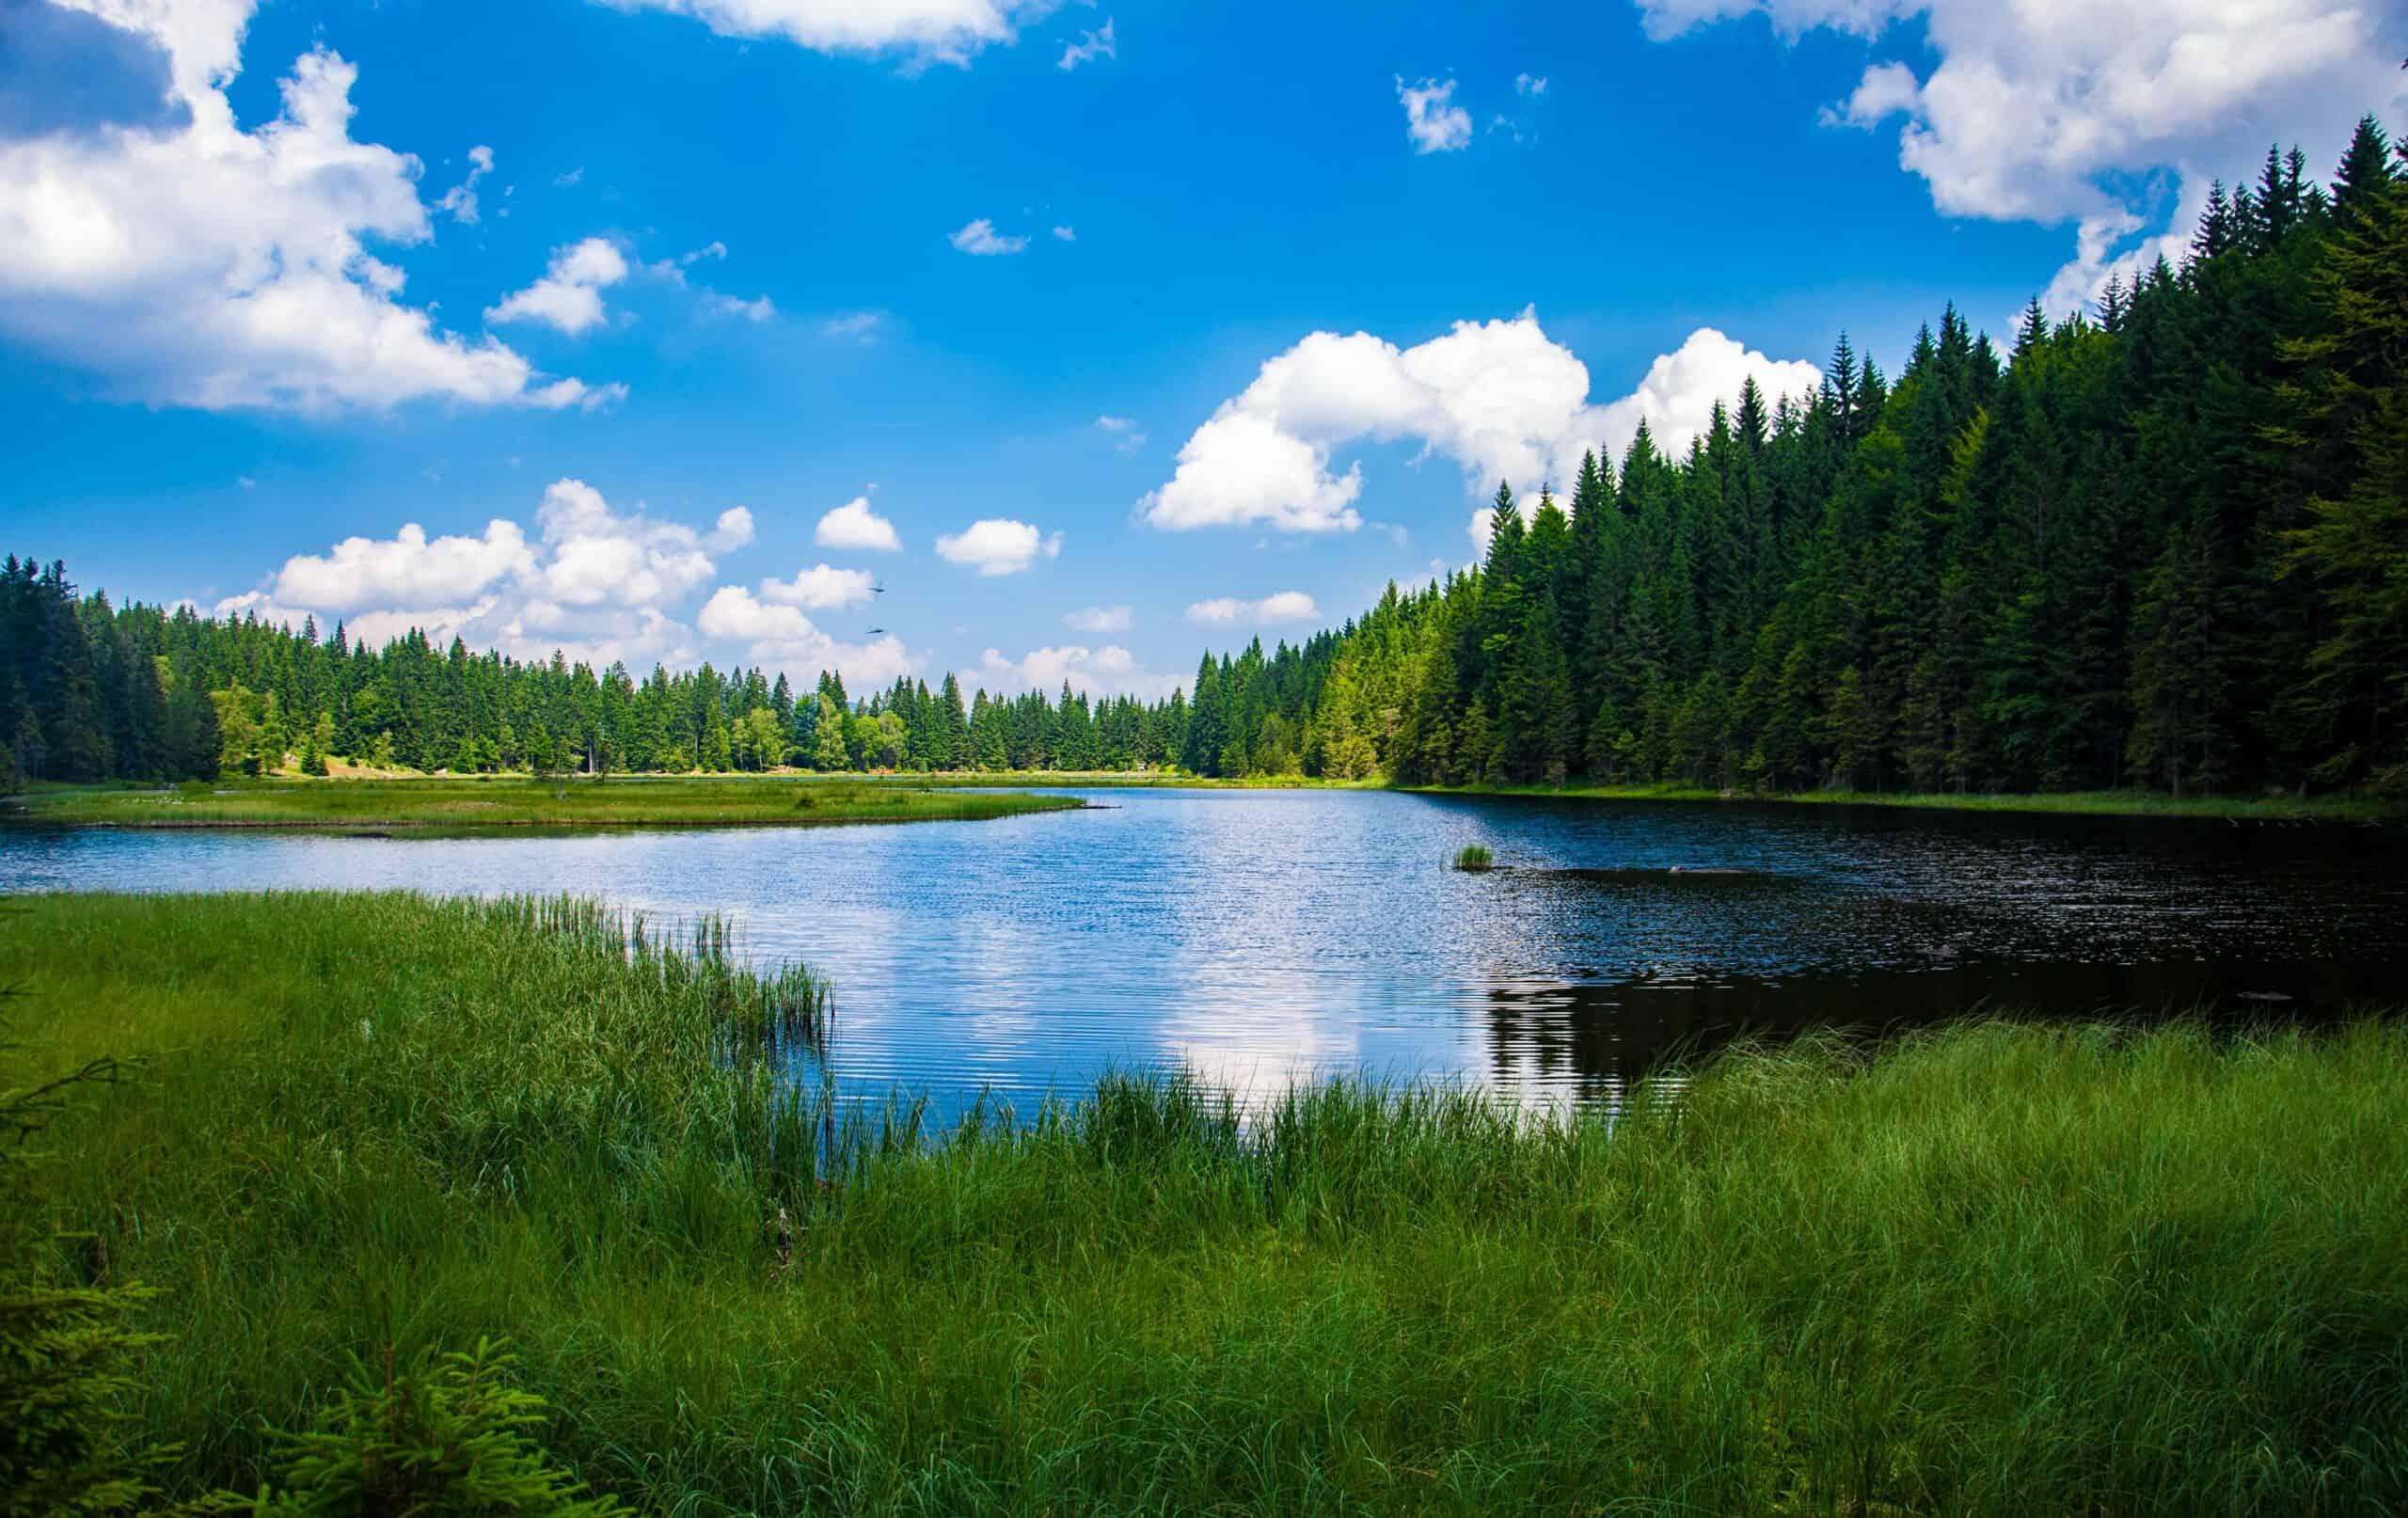 A stunning lake amidst greenery